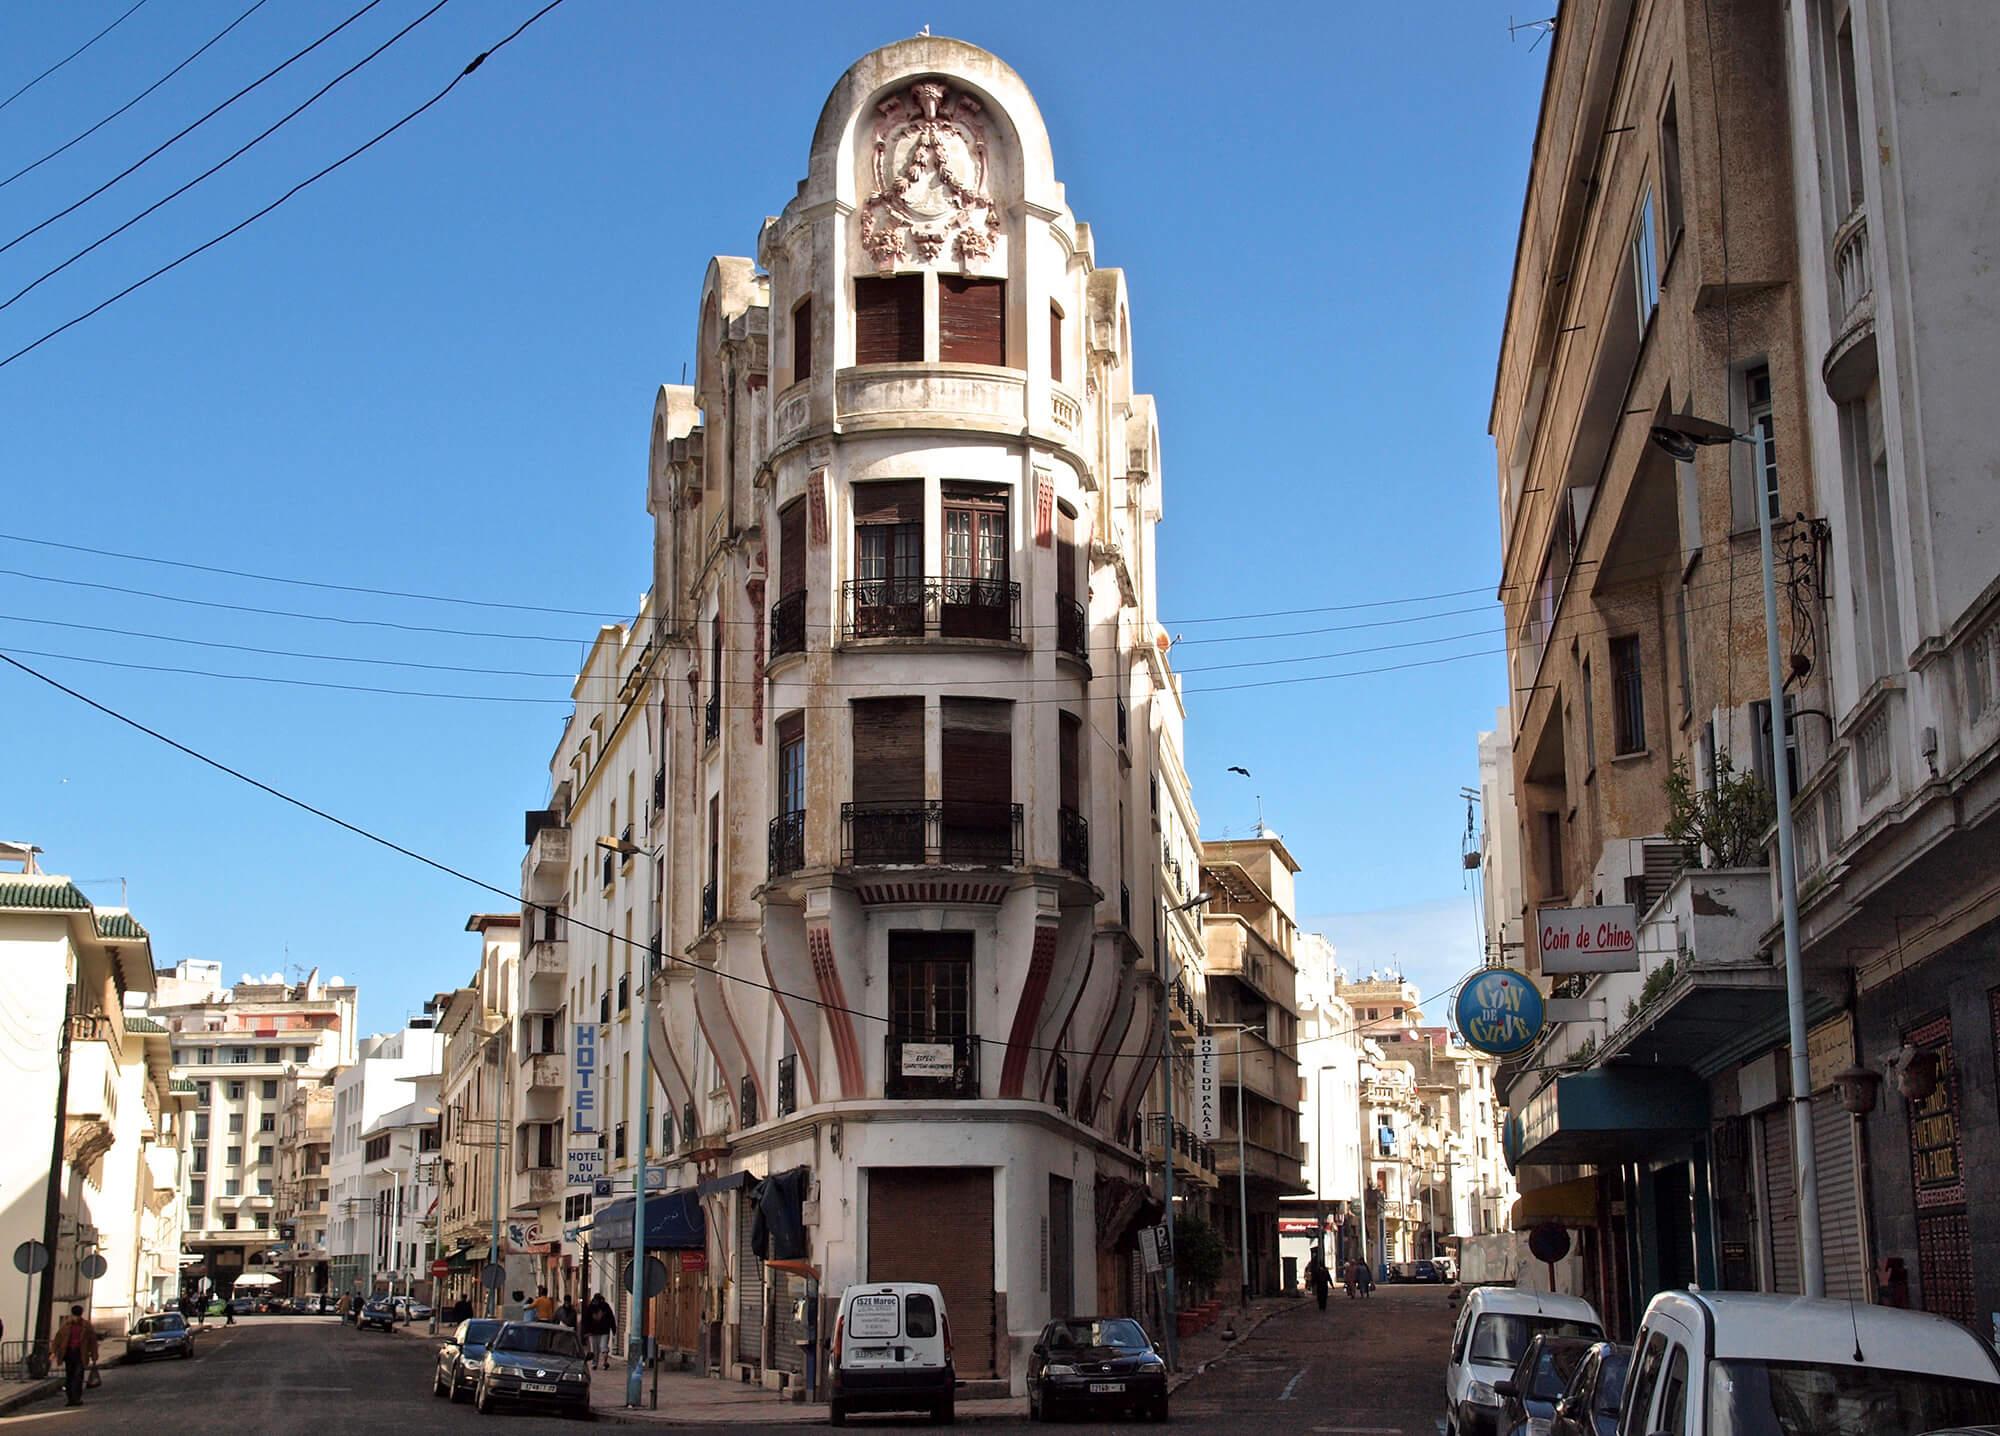 Sahara Desert Tour - Discover Casablanca - What to See and What to Do - Explore Art Deco